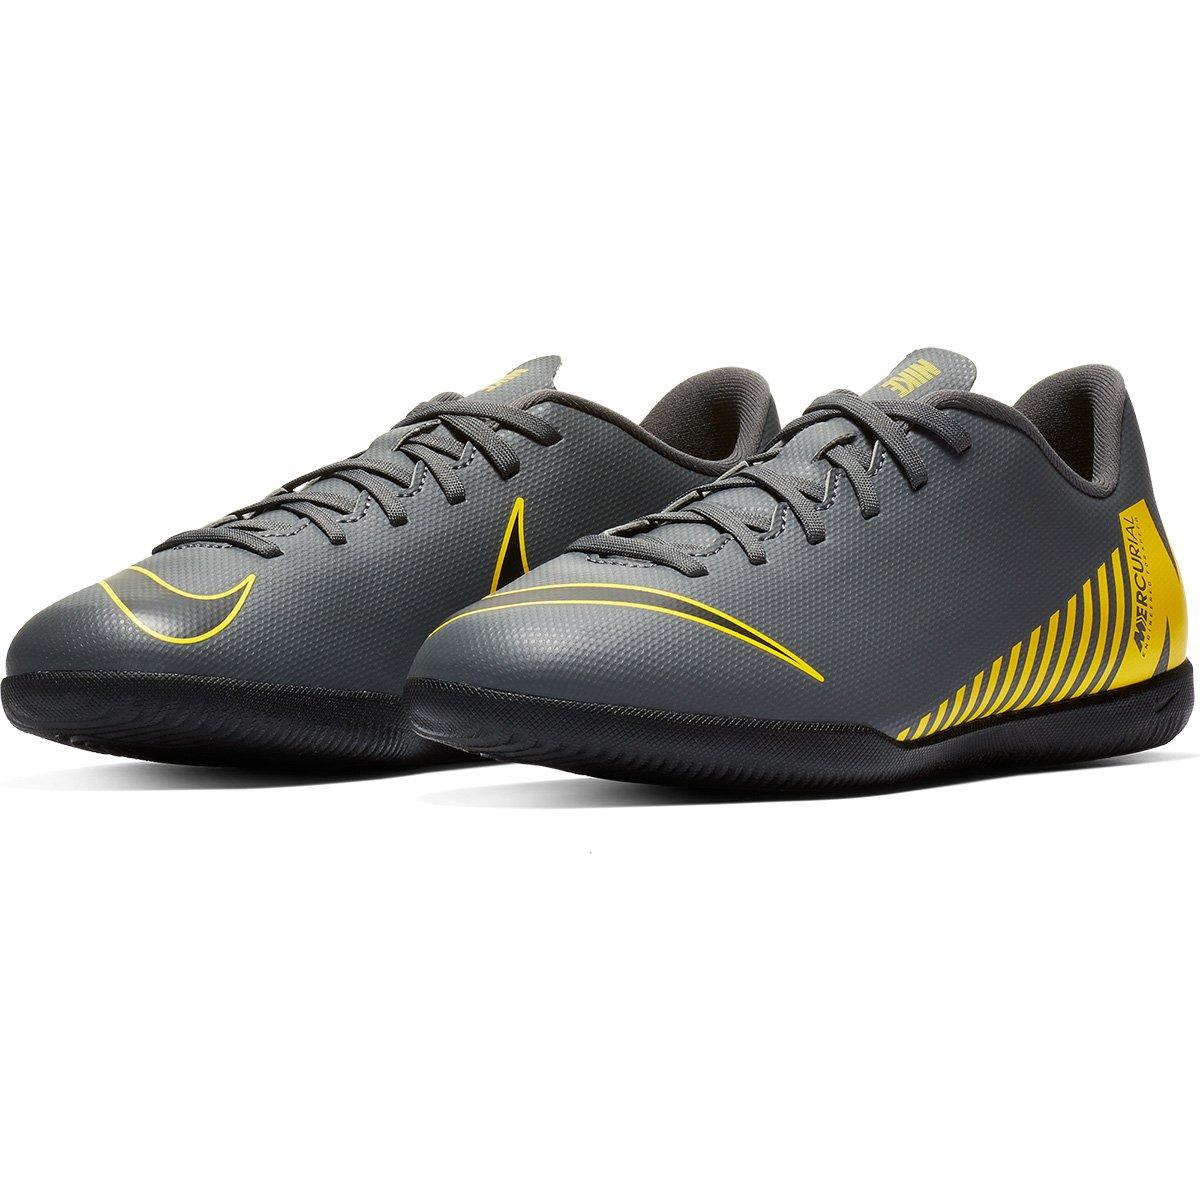 8862f0d46c Chuteira Futsal Infantil Nike Mercurial Vapor 12 Club Gs IC - Cinza e  Amarelo